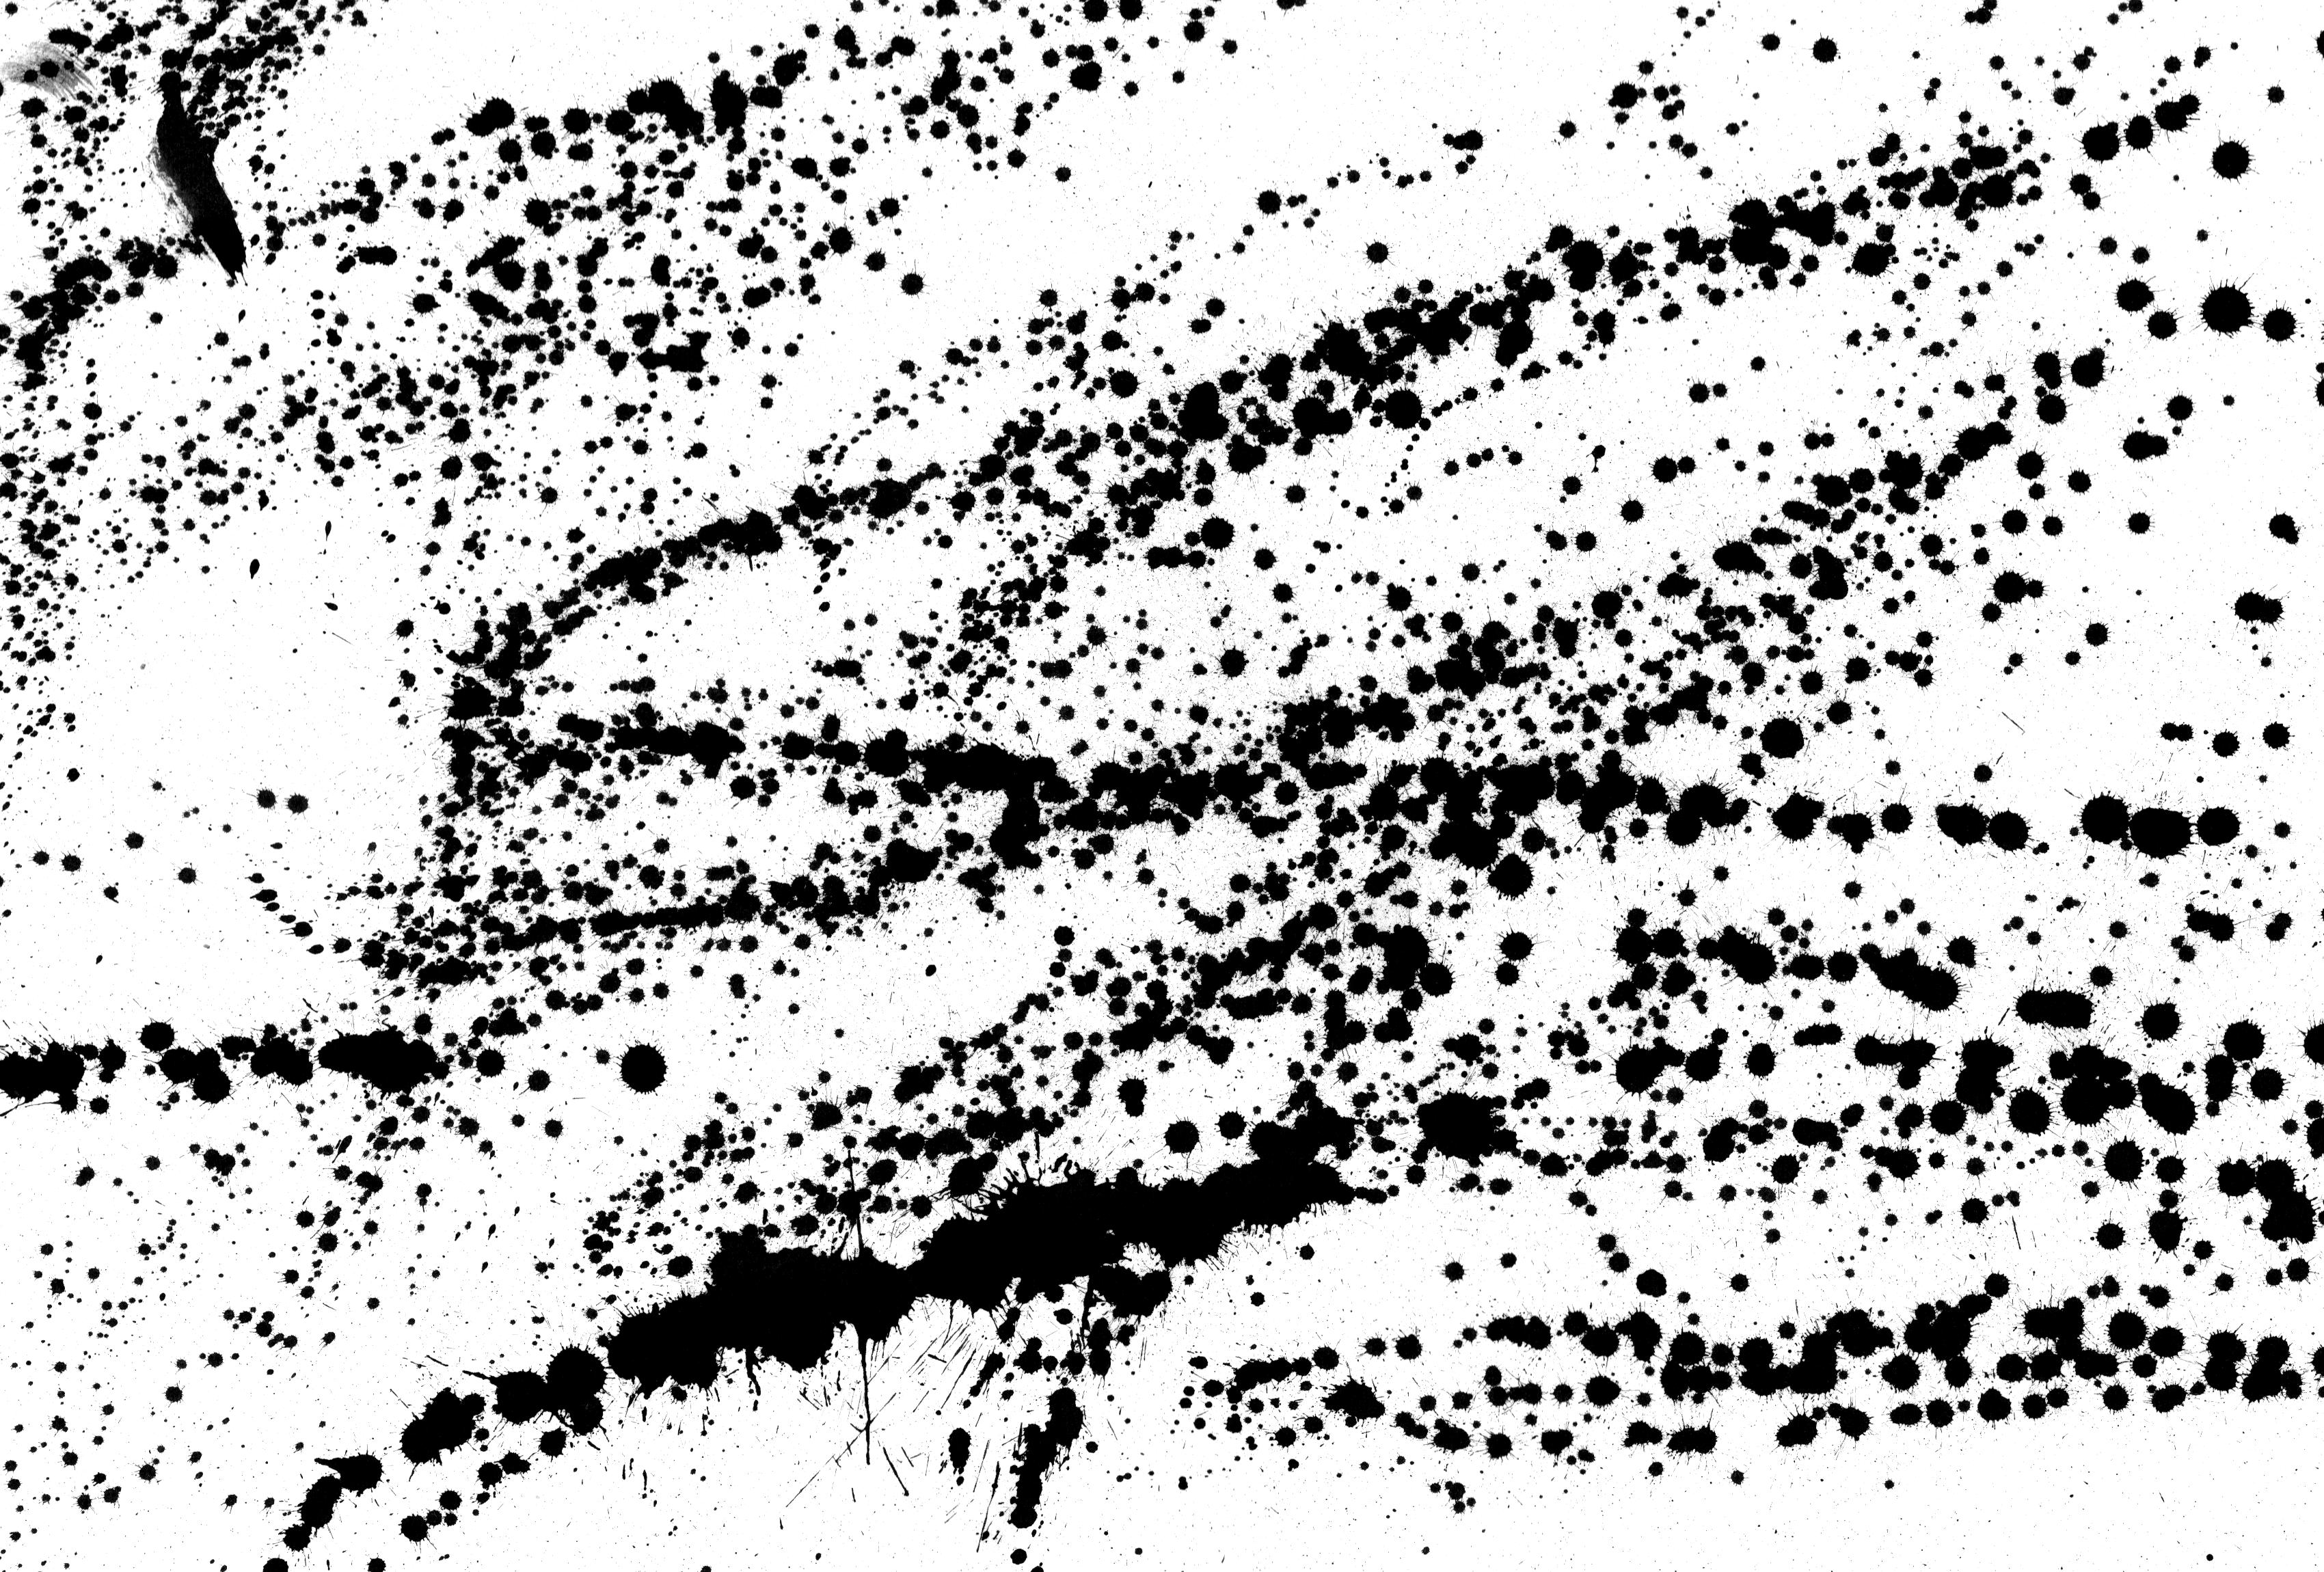 Ink Splatter Texture PNG OnlyGFXcom